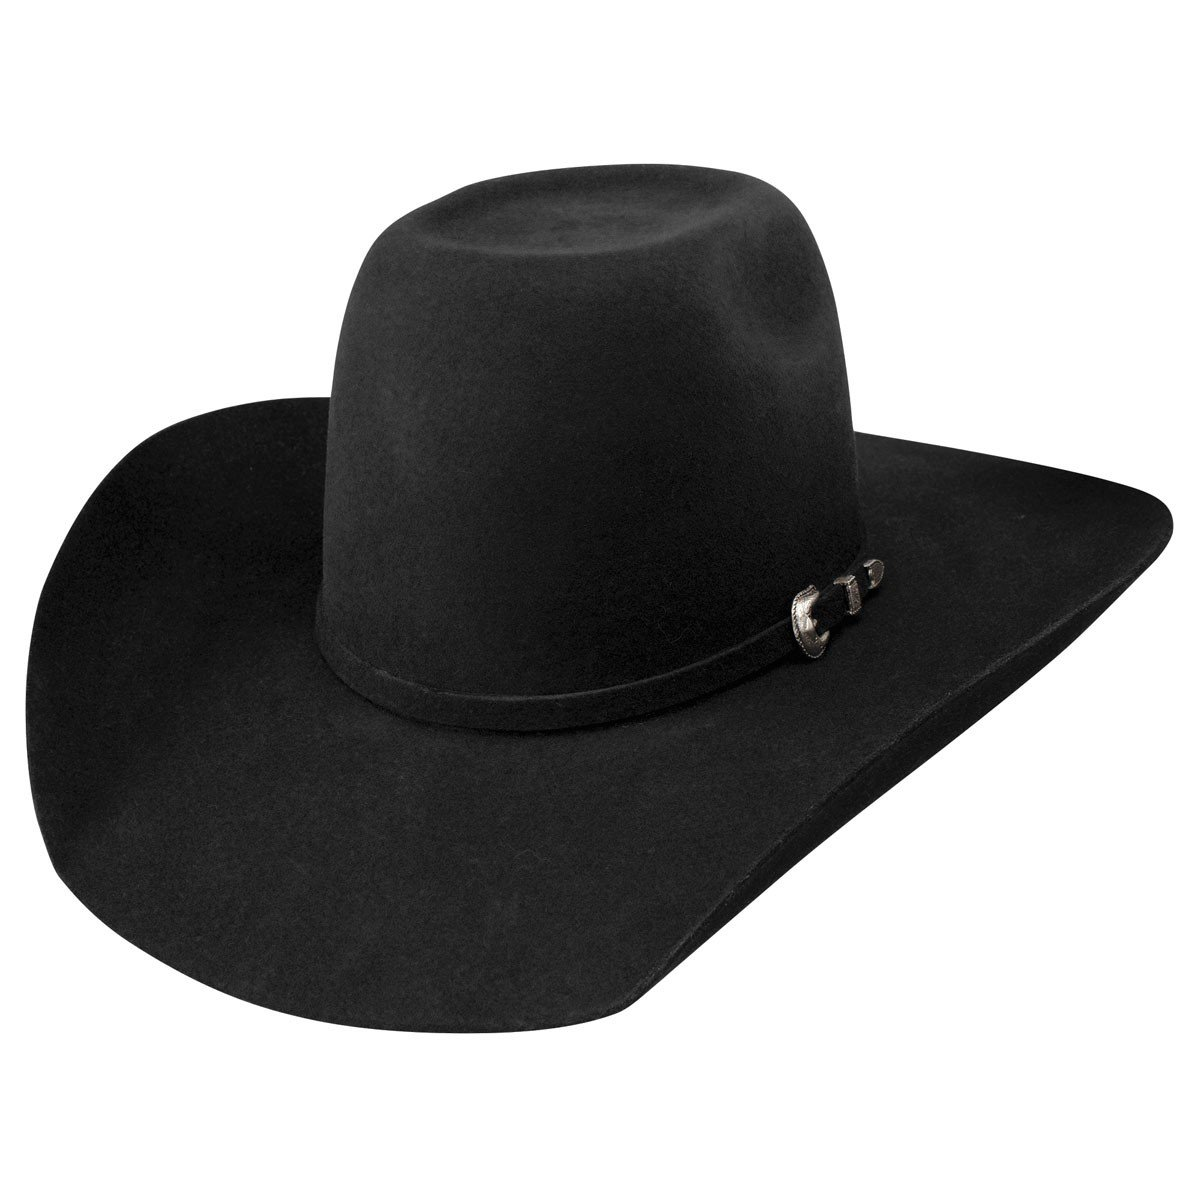 Resistol ''Pay Window Jr.'' Boy's Black Cowboy Hat